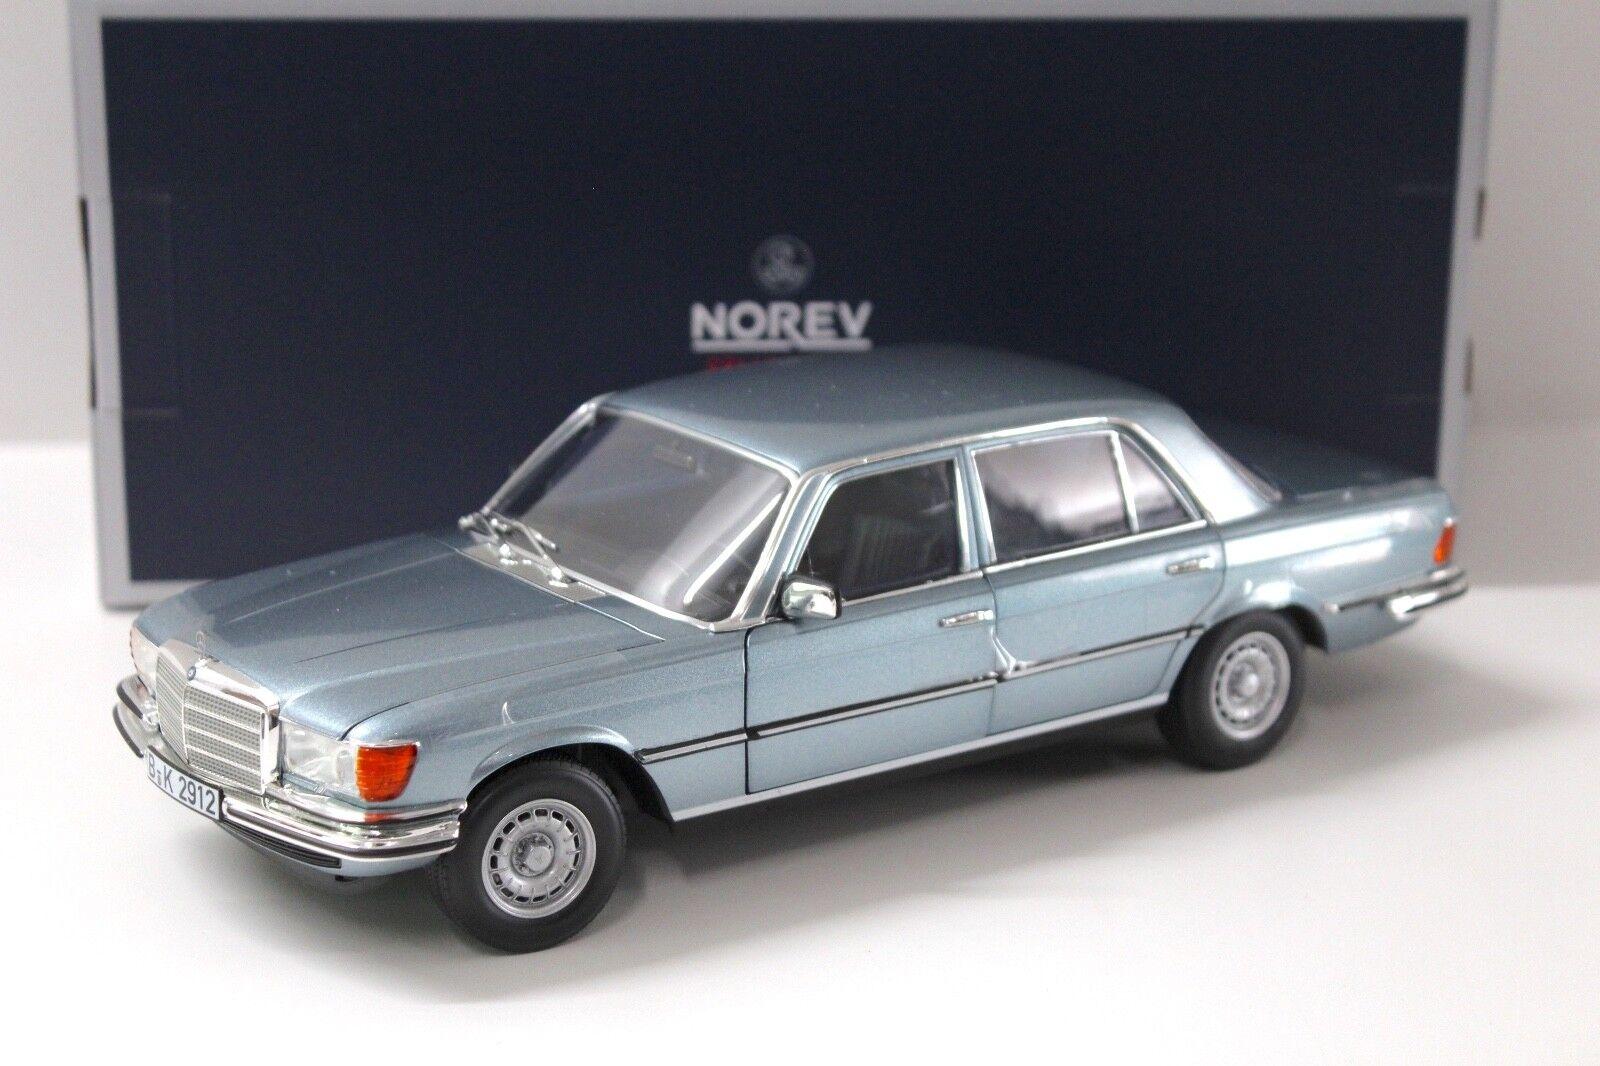 1:18 NOREV MERCEDES 450 SEL 6.9 - 1976 LIGHT BLUE NEW in Premium-MODELCARS